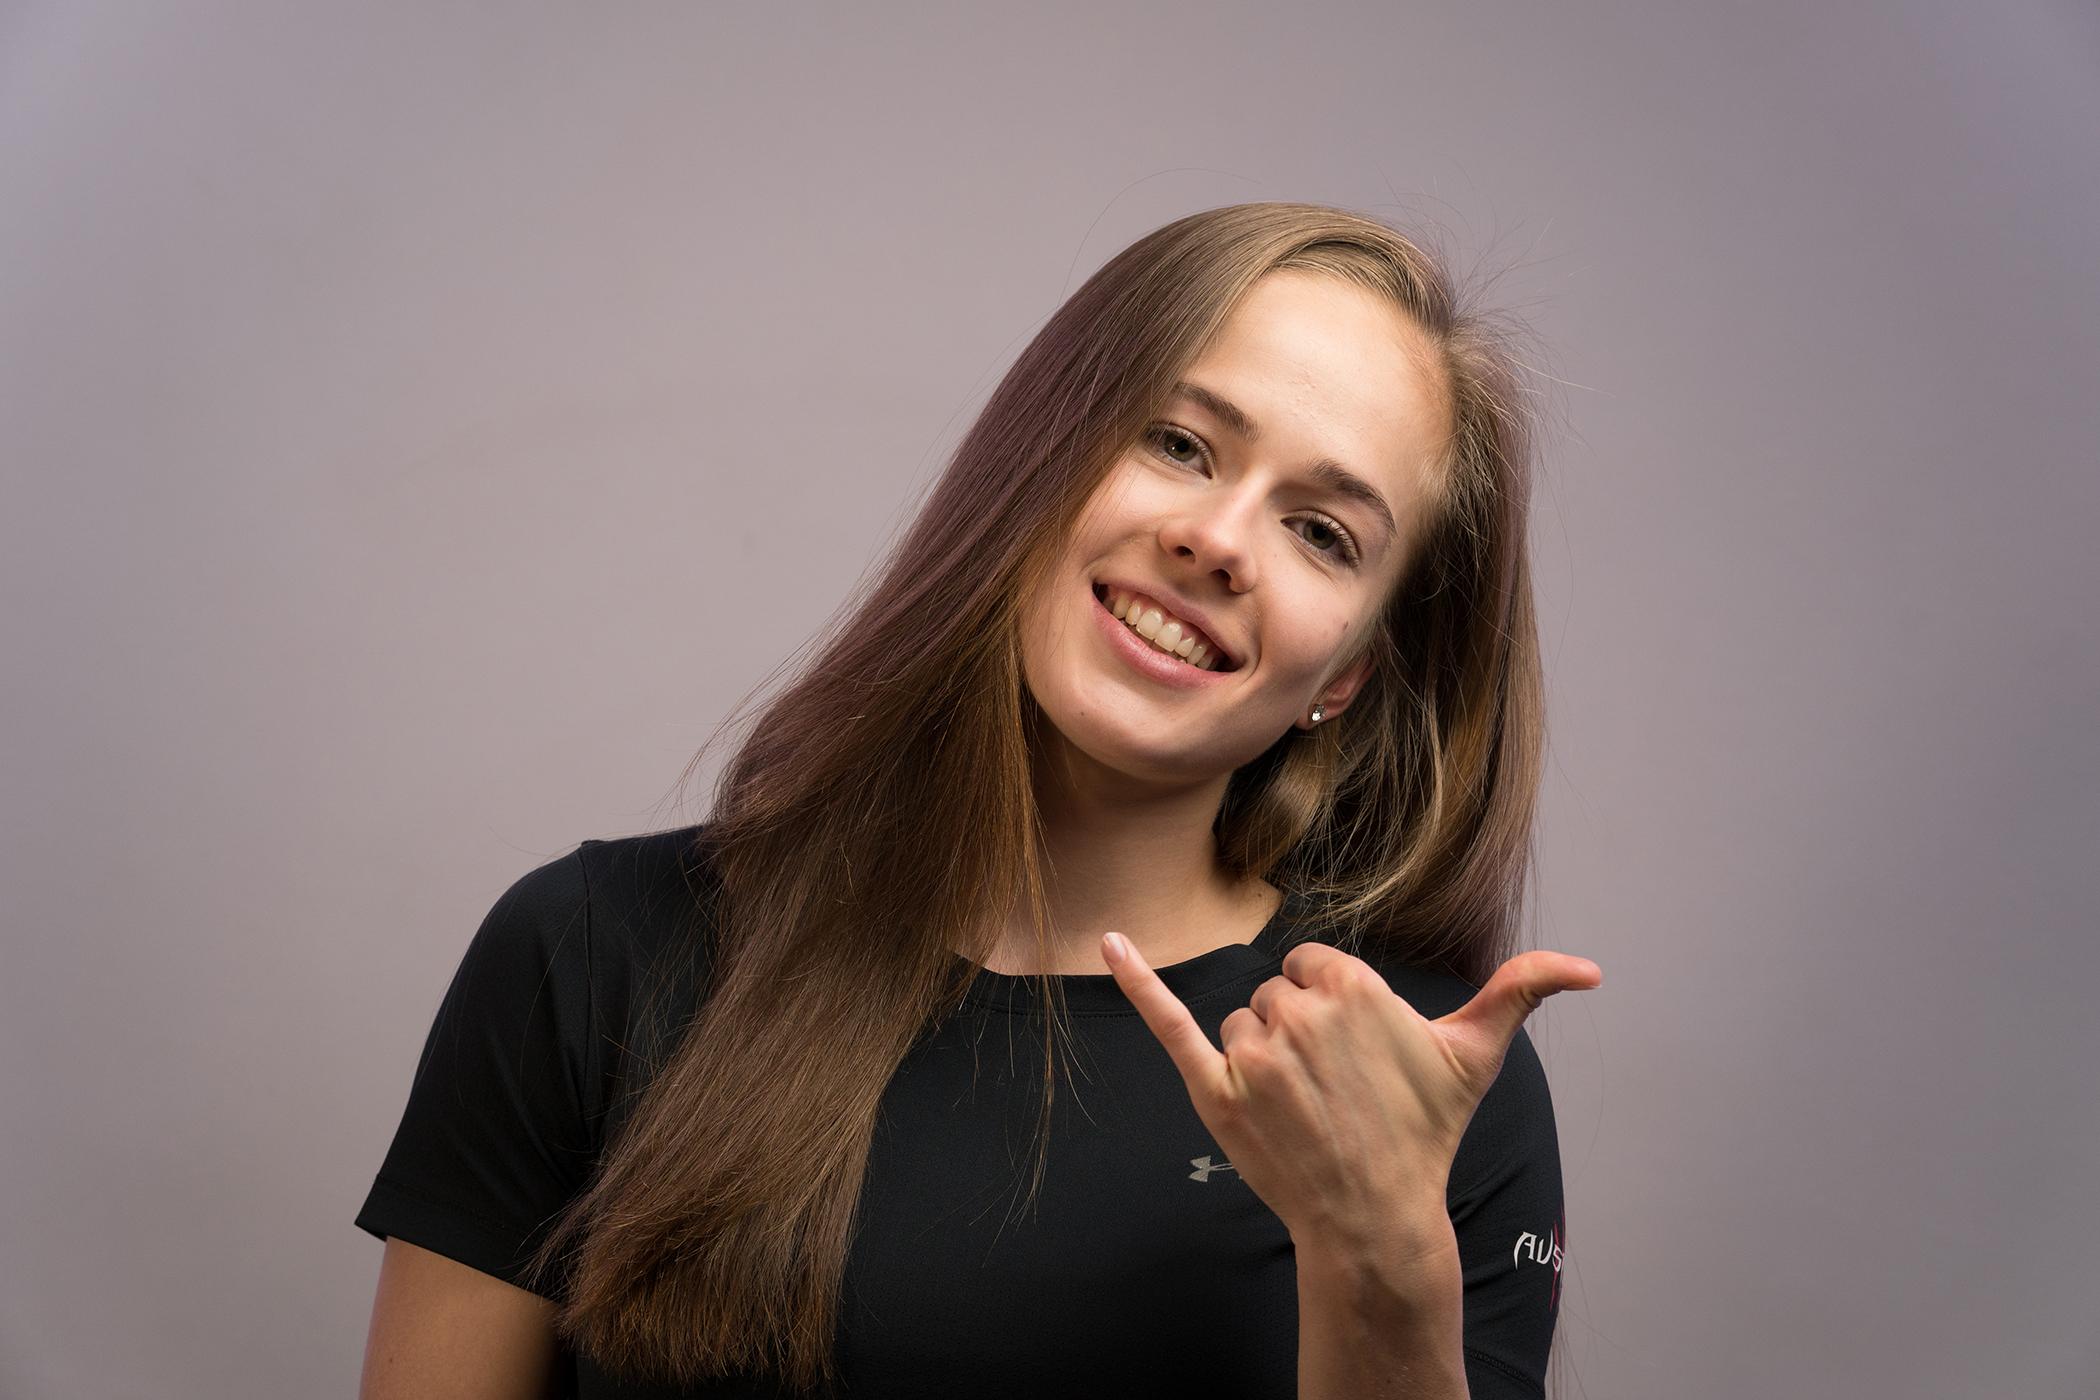 Nadine Langweil